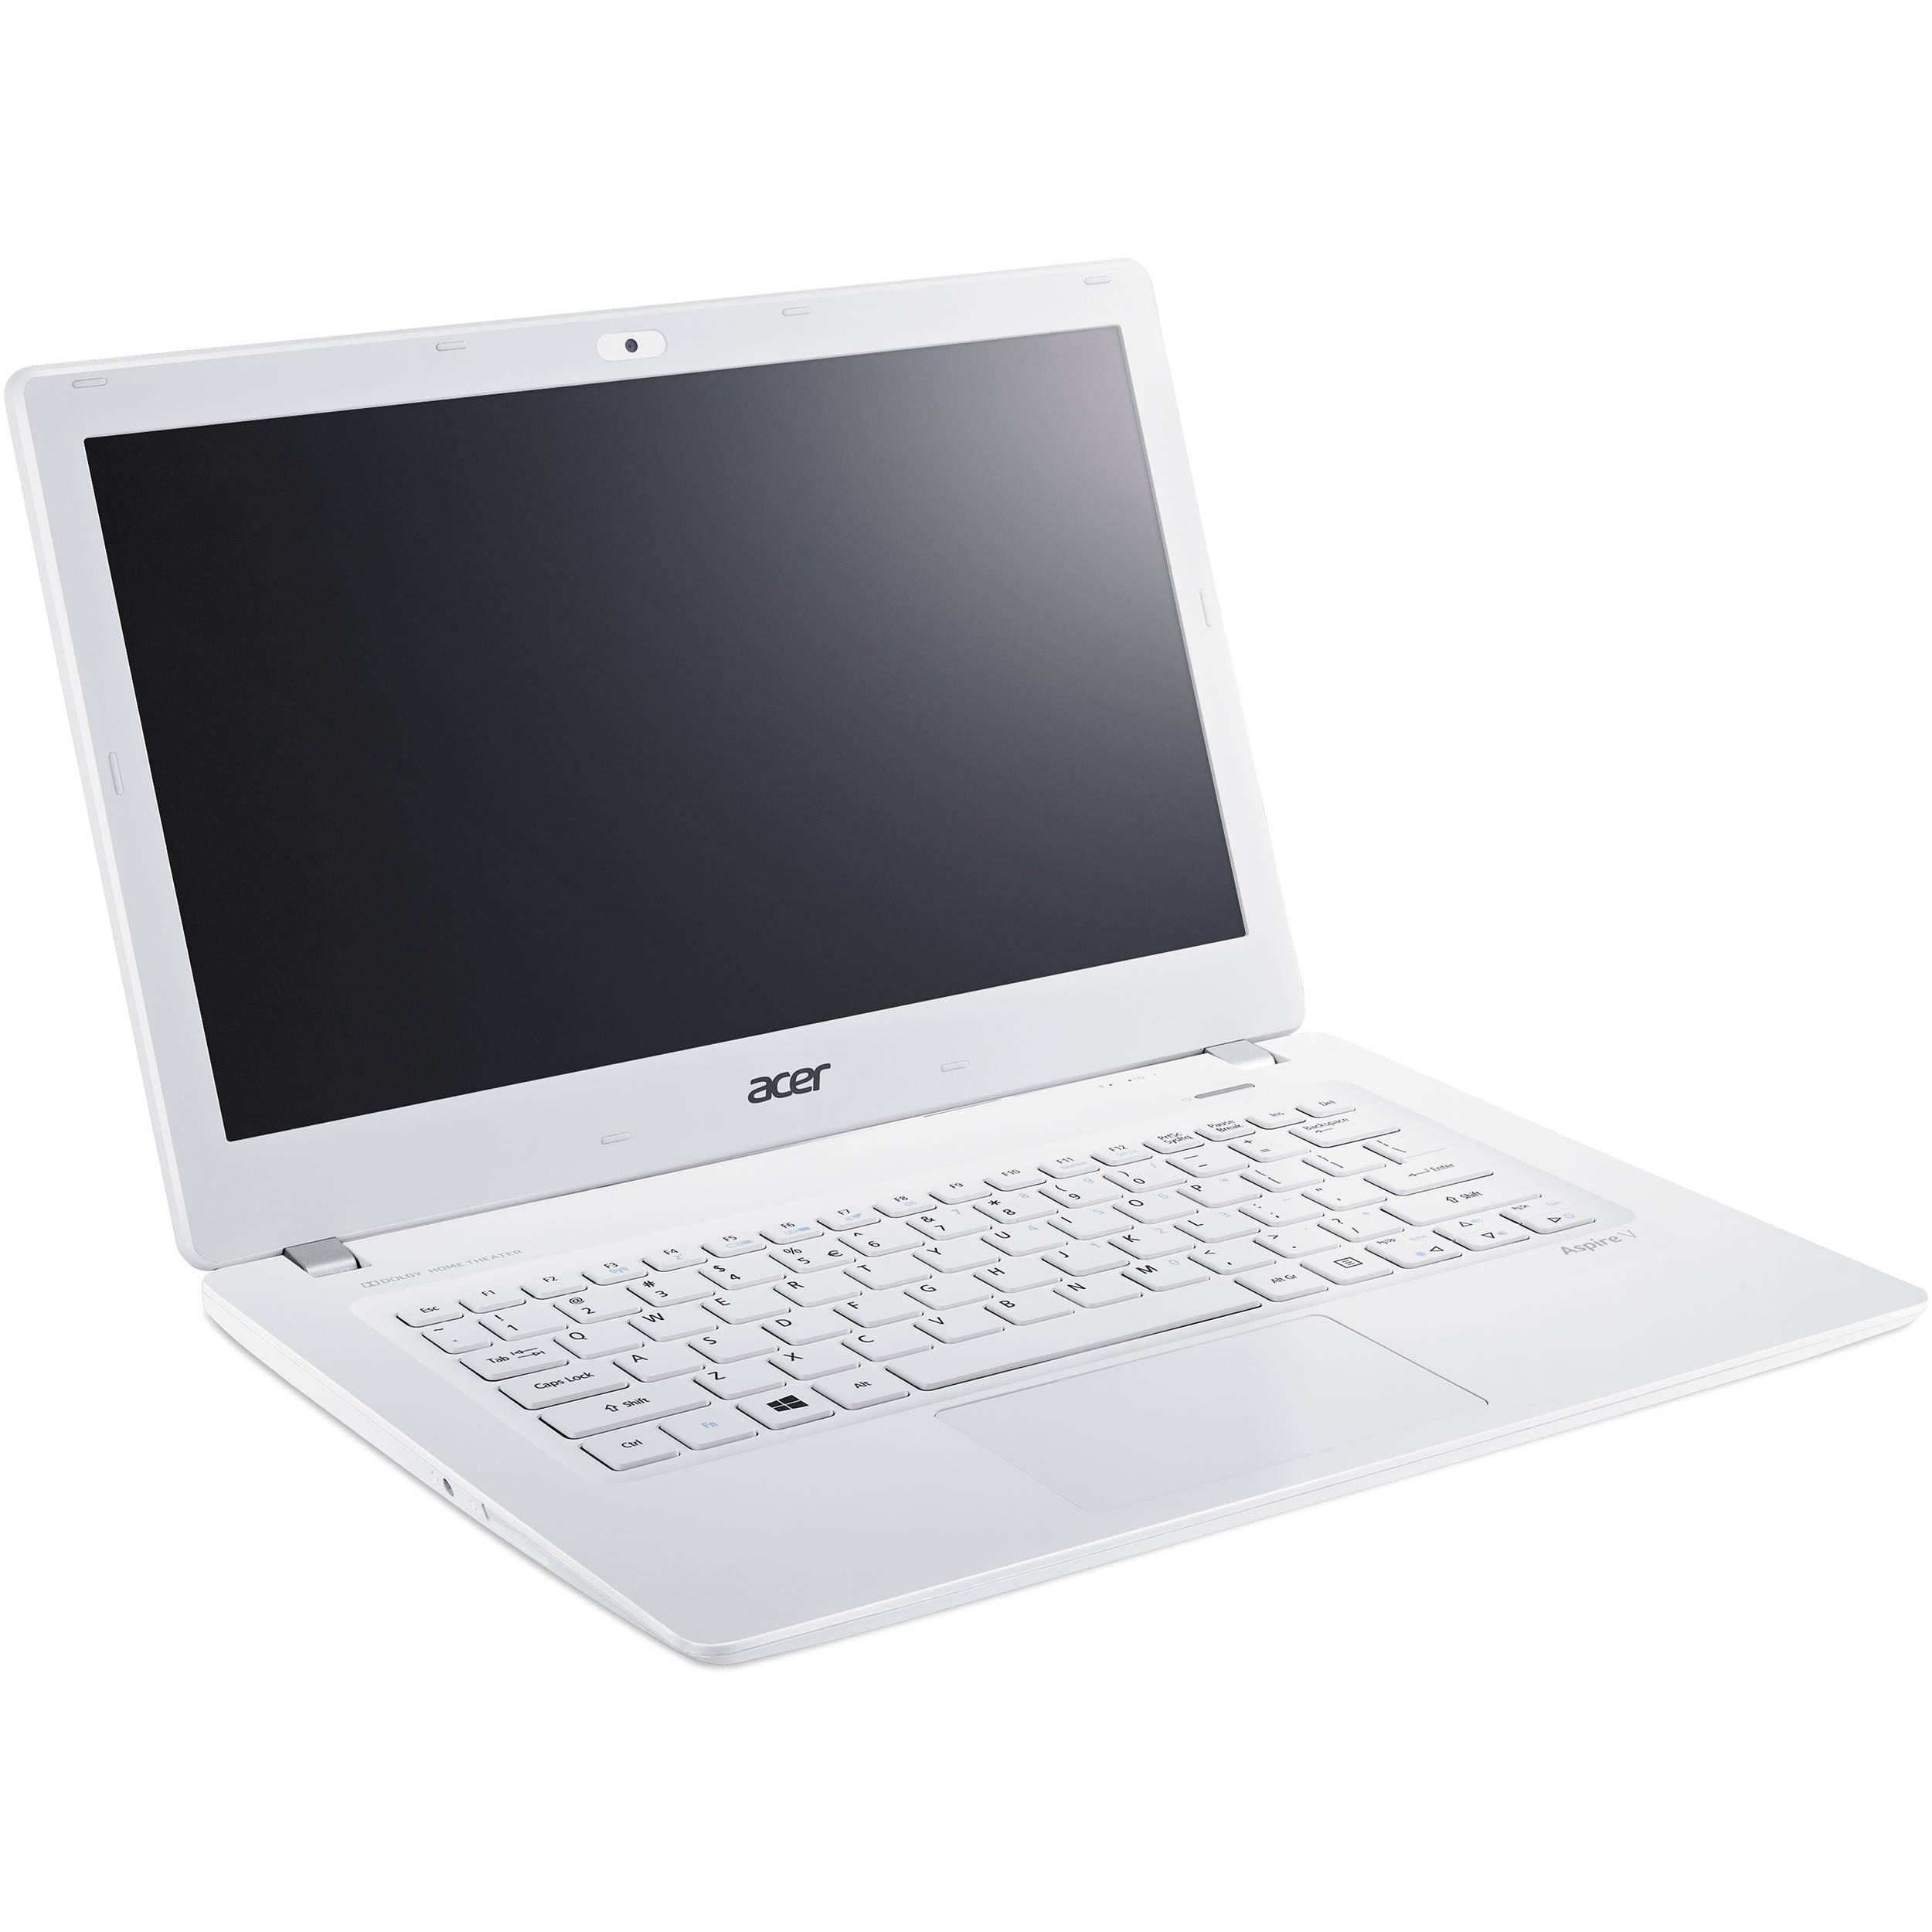 Driver for Acer Extensa 4210 Notebook Atheros WLAN